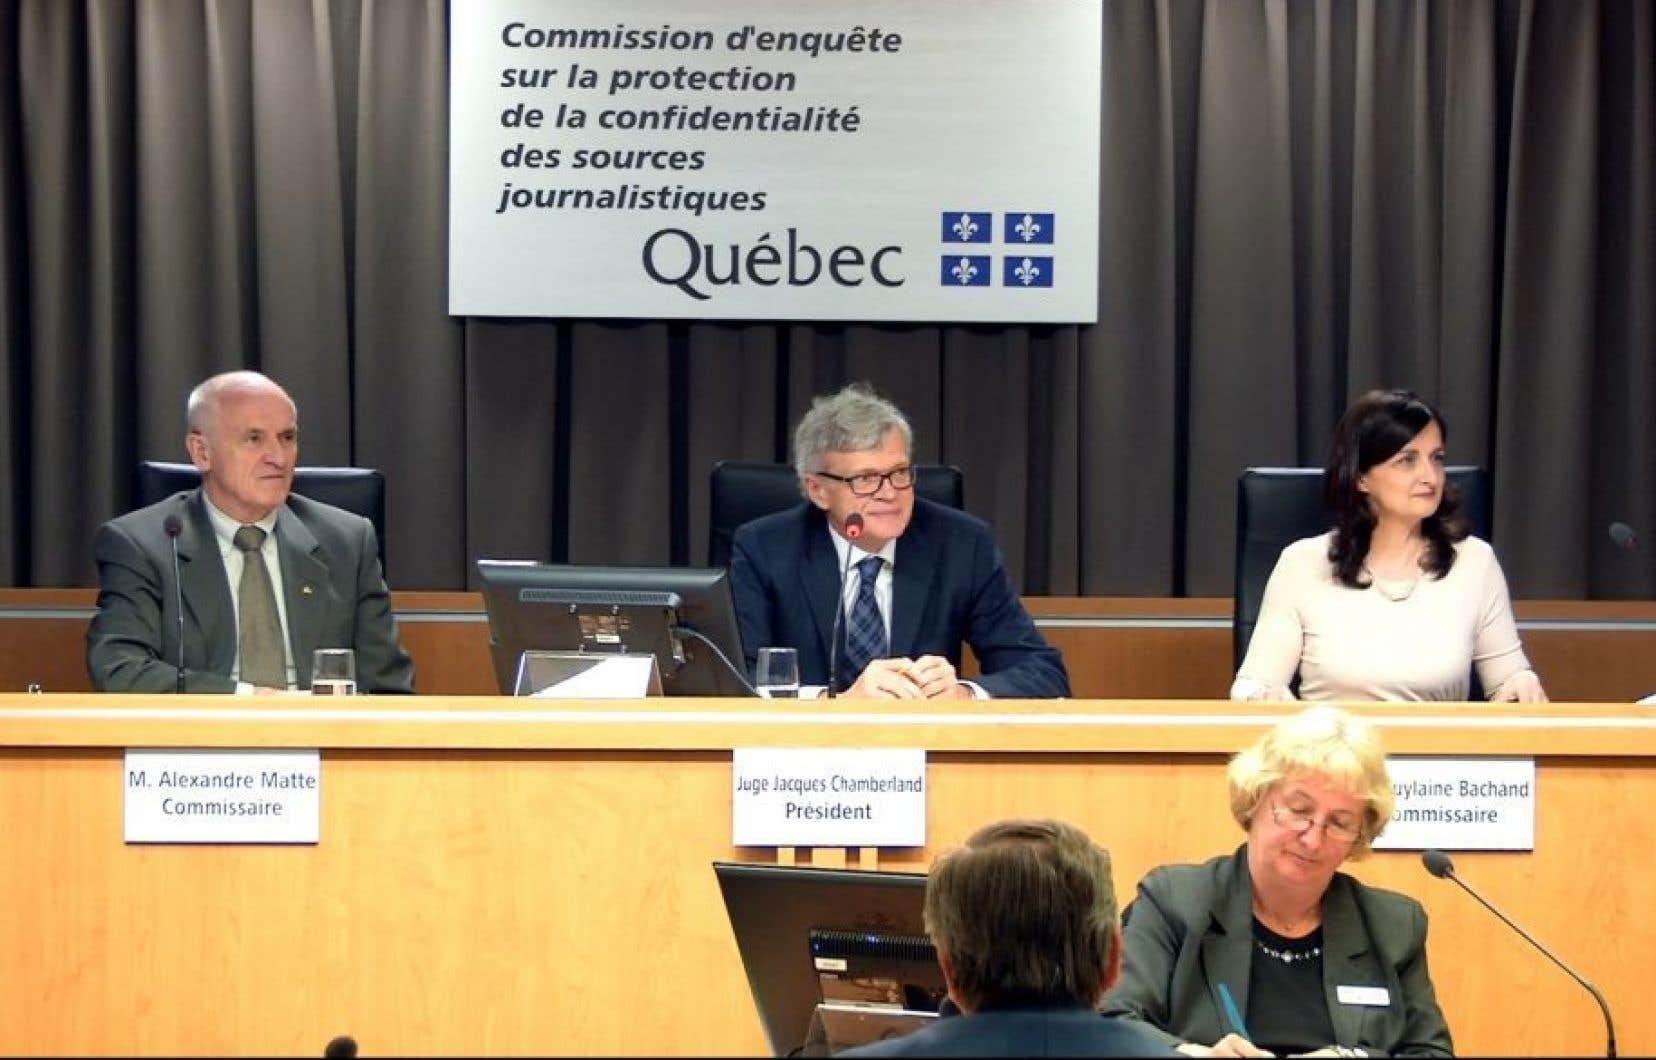 Les commissaires Alexandre Matte, Jacques Chamberland et Guylaine Bachand